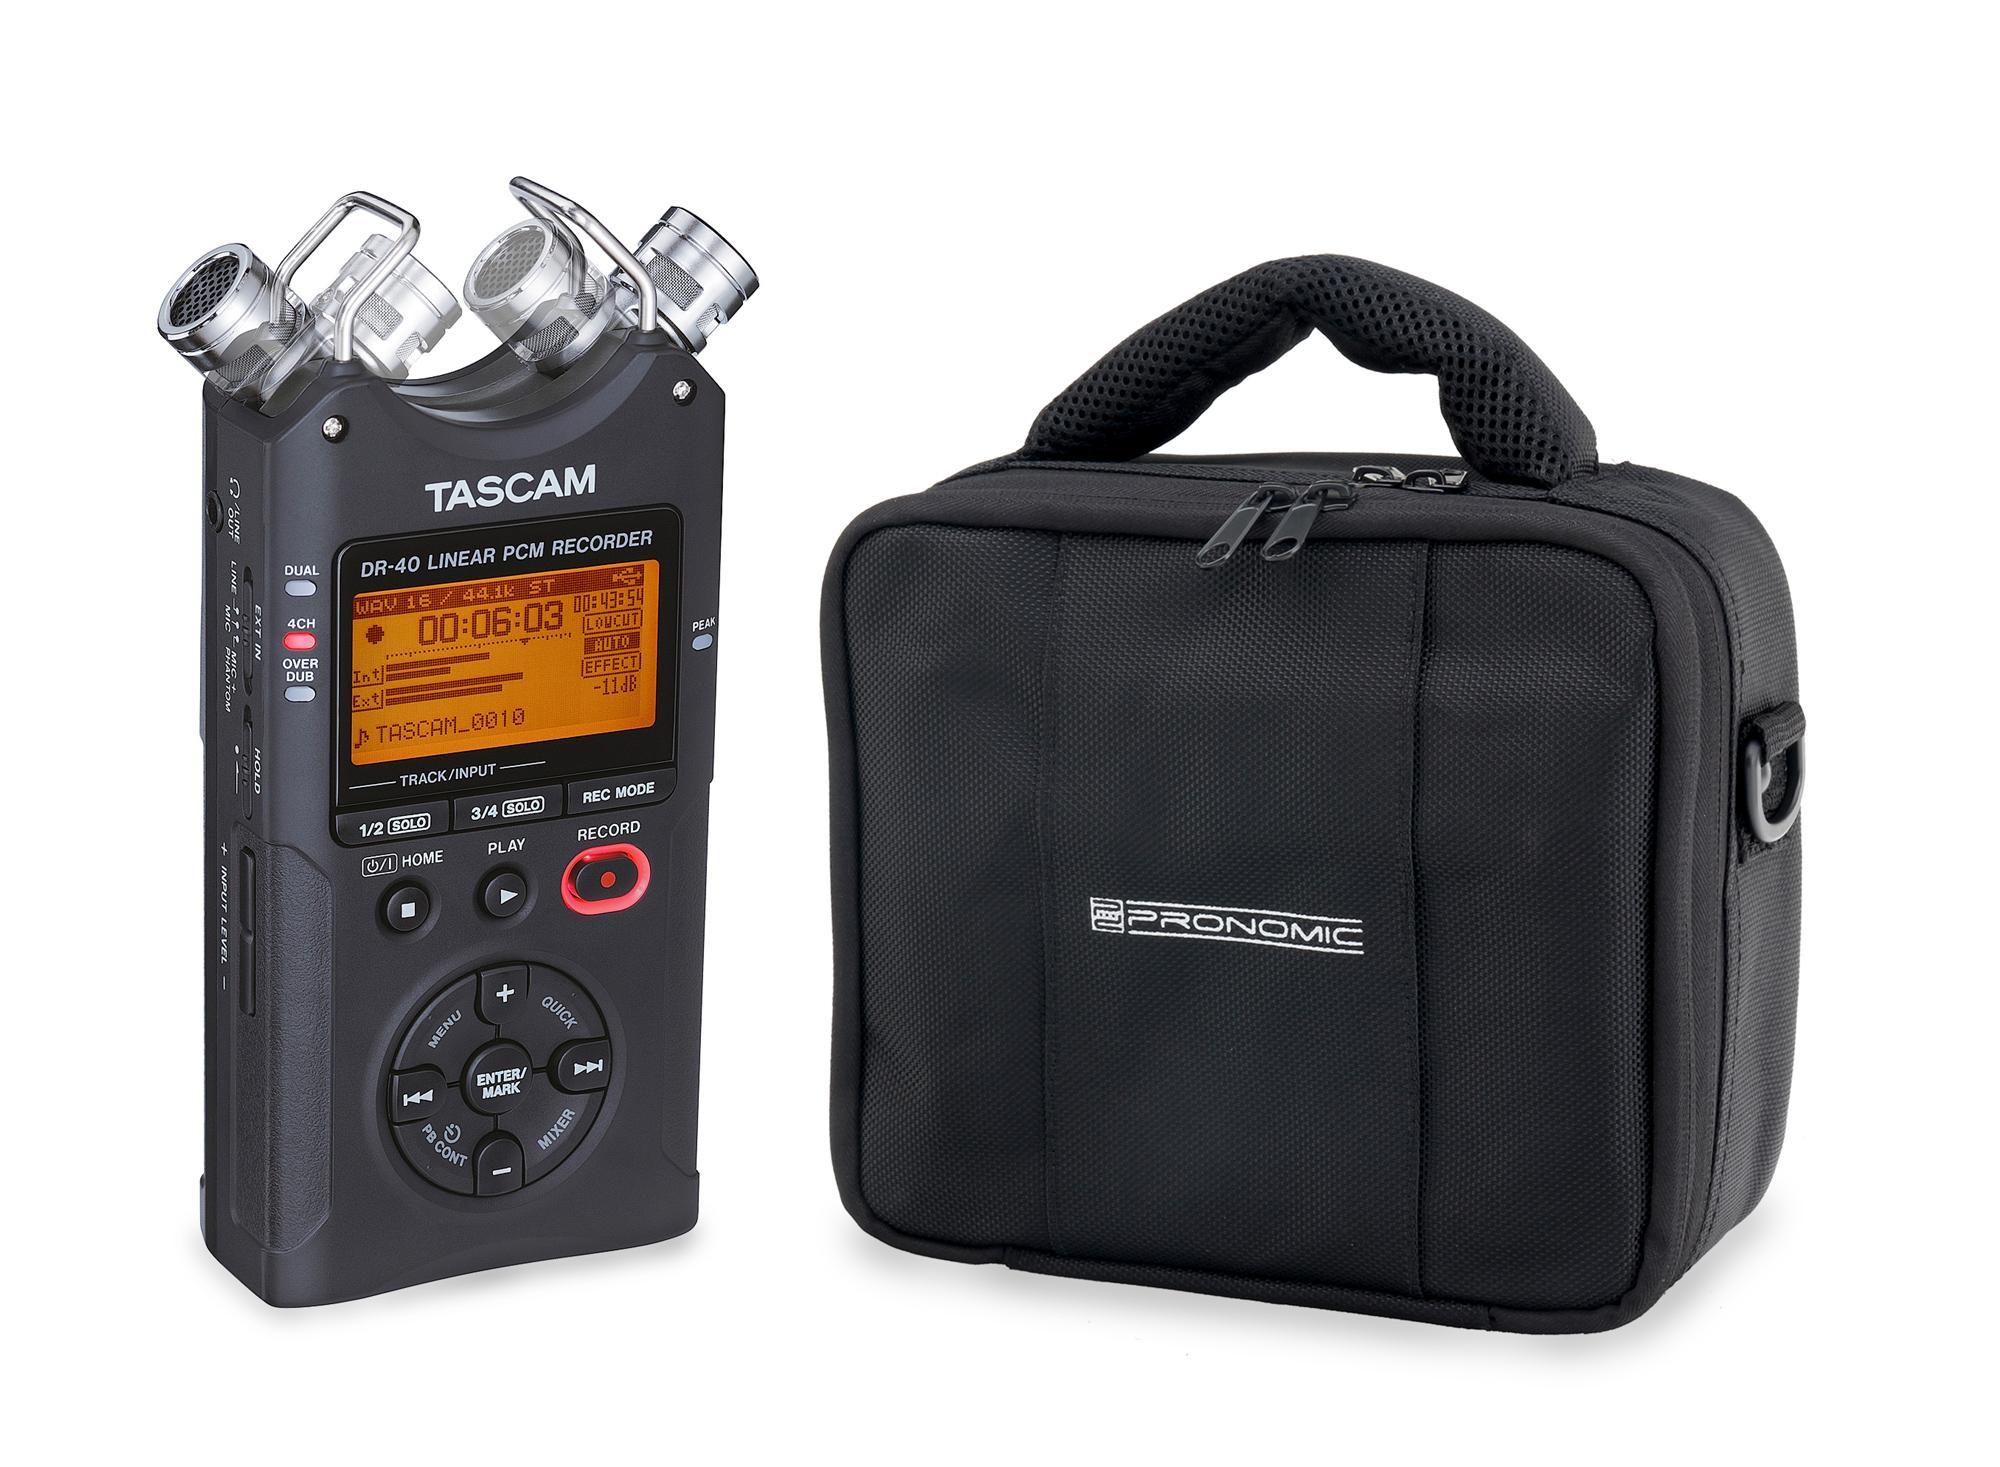 Tascam DR 40 PCM|MP3 Recorder inkl. Pronomic Tasche im SET